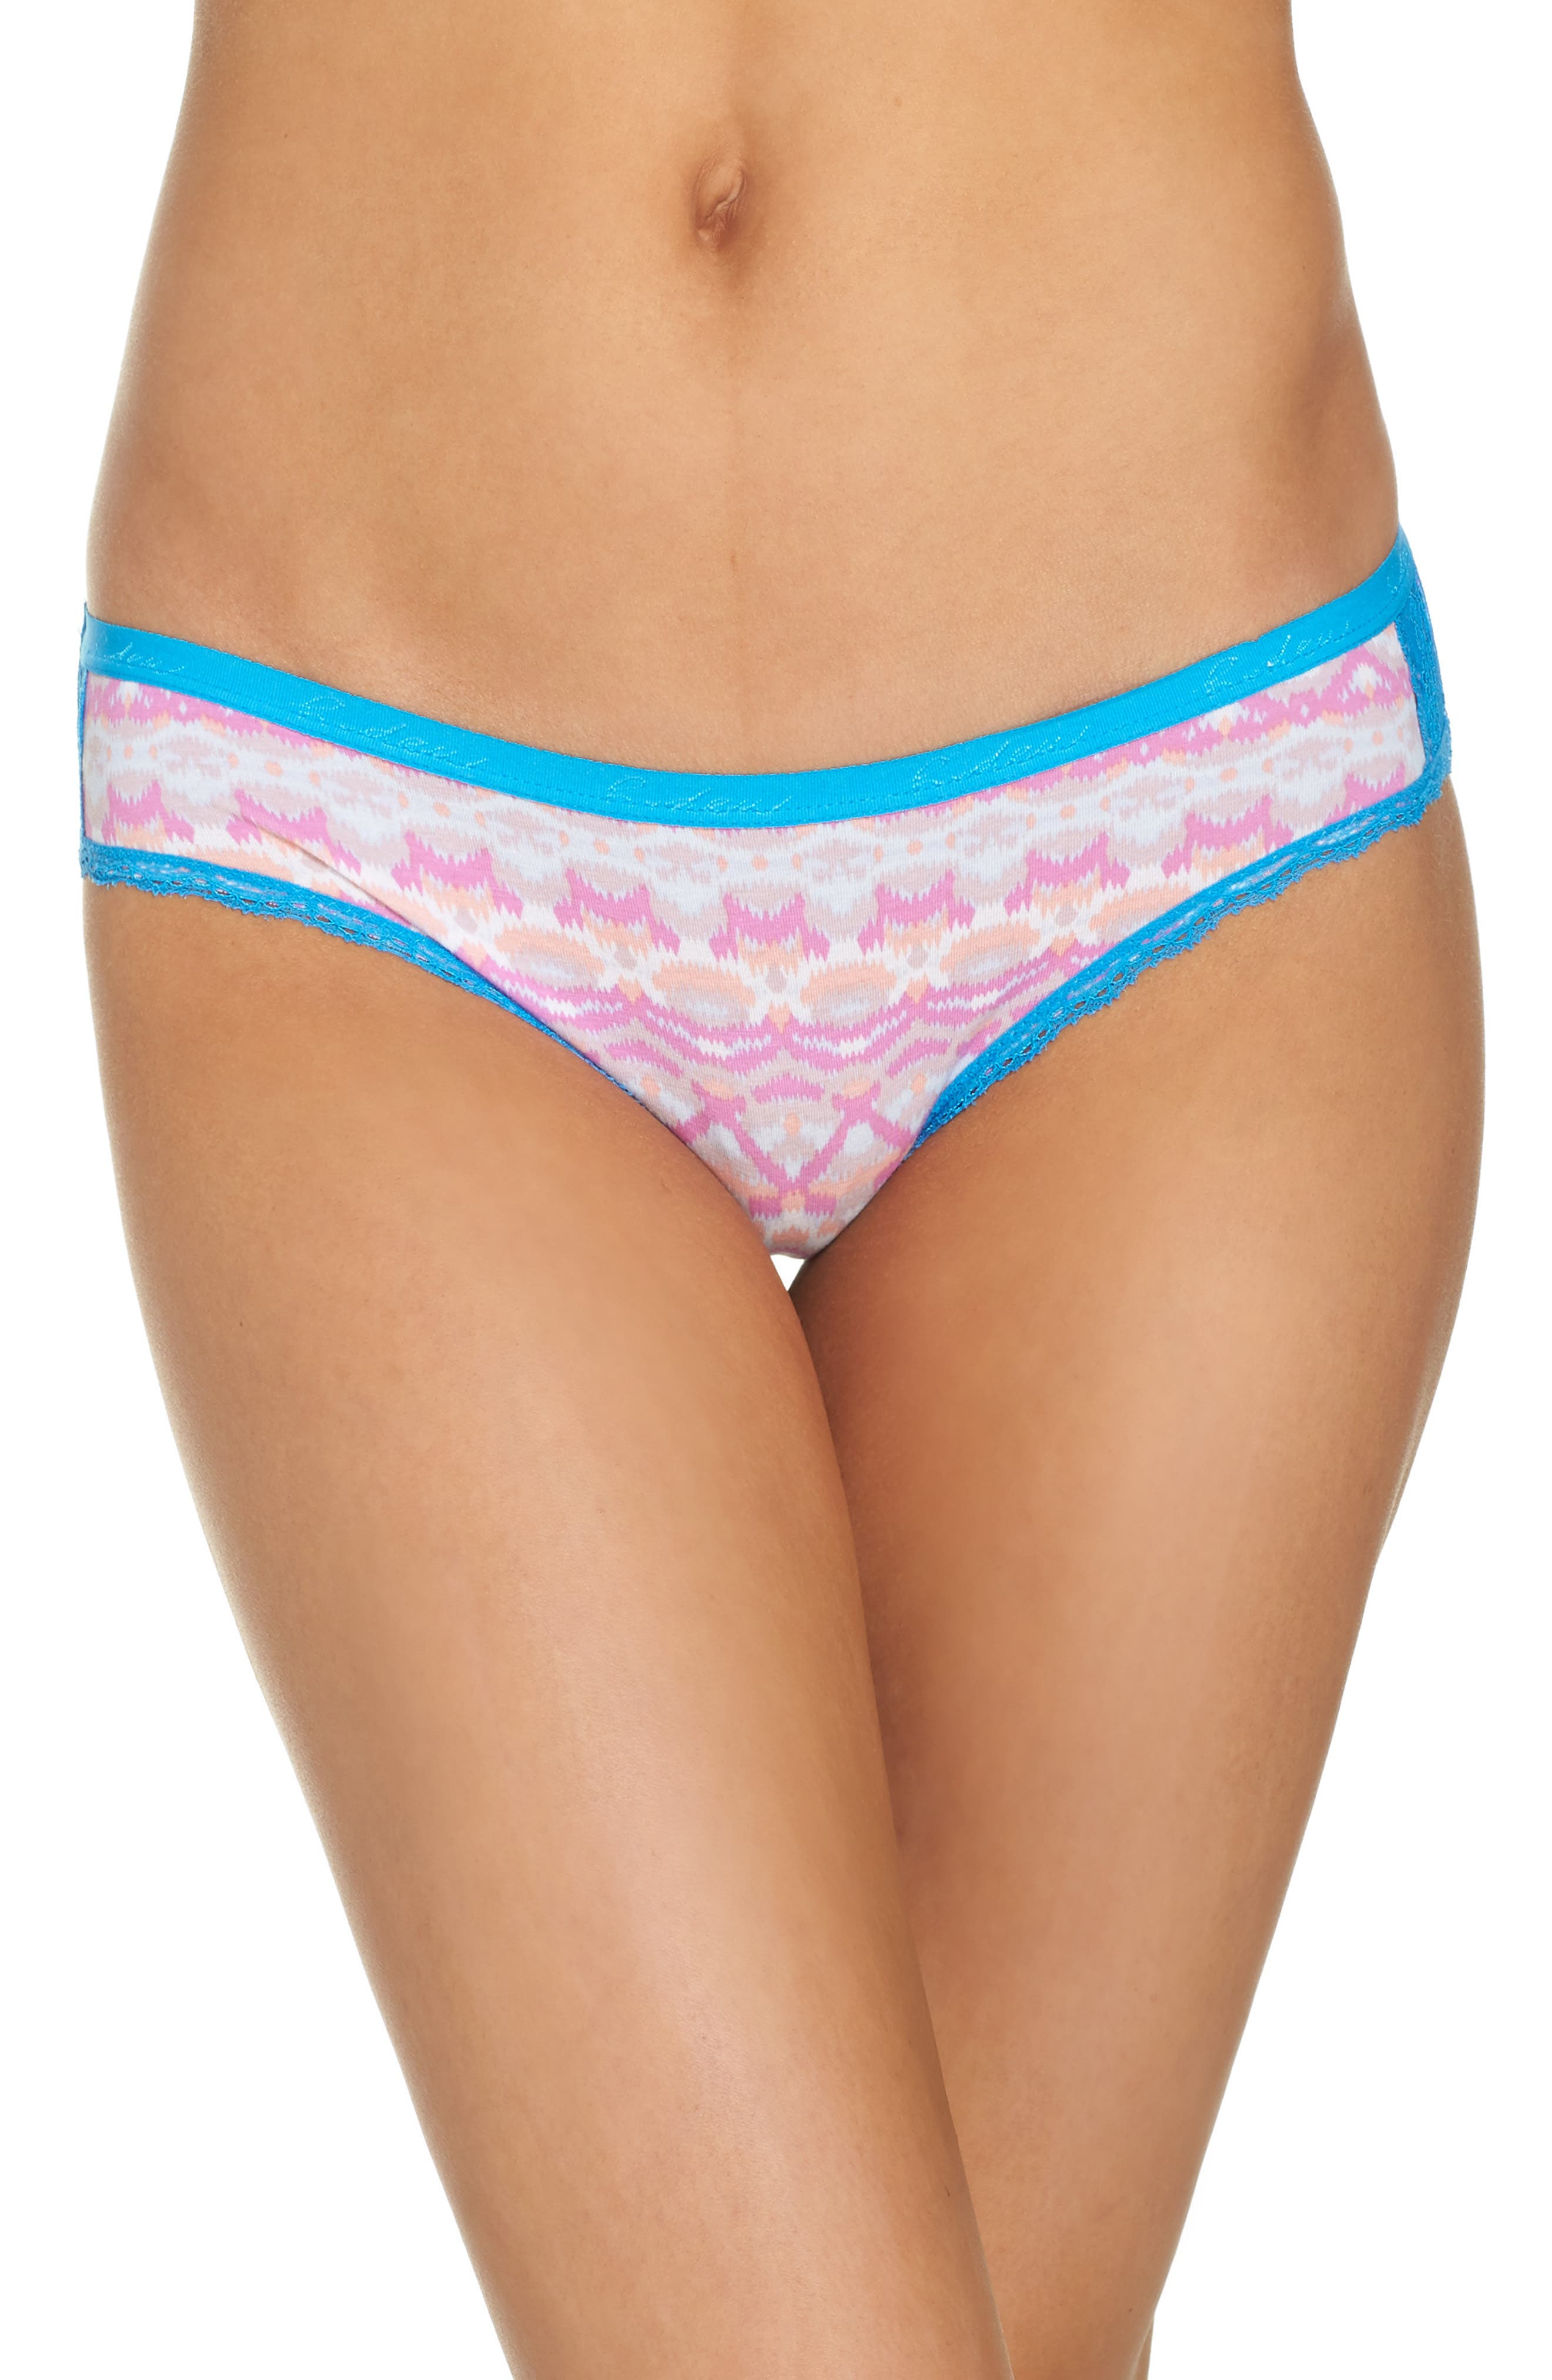 h.dew Jessi Bikini (Regular & Plus Size) (5 for $30)